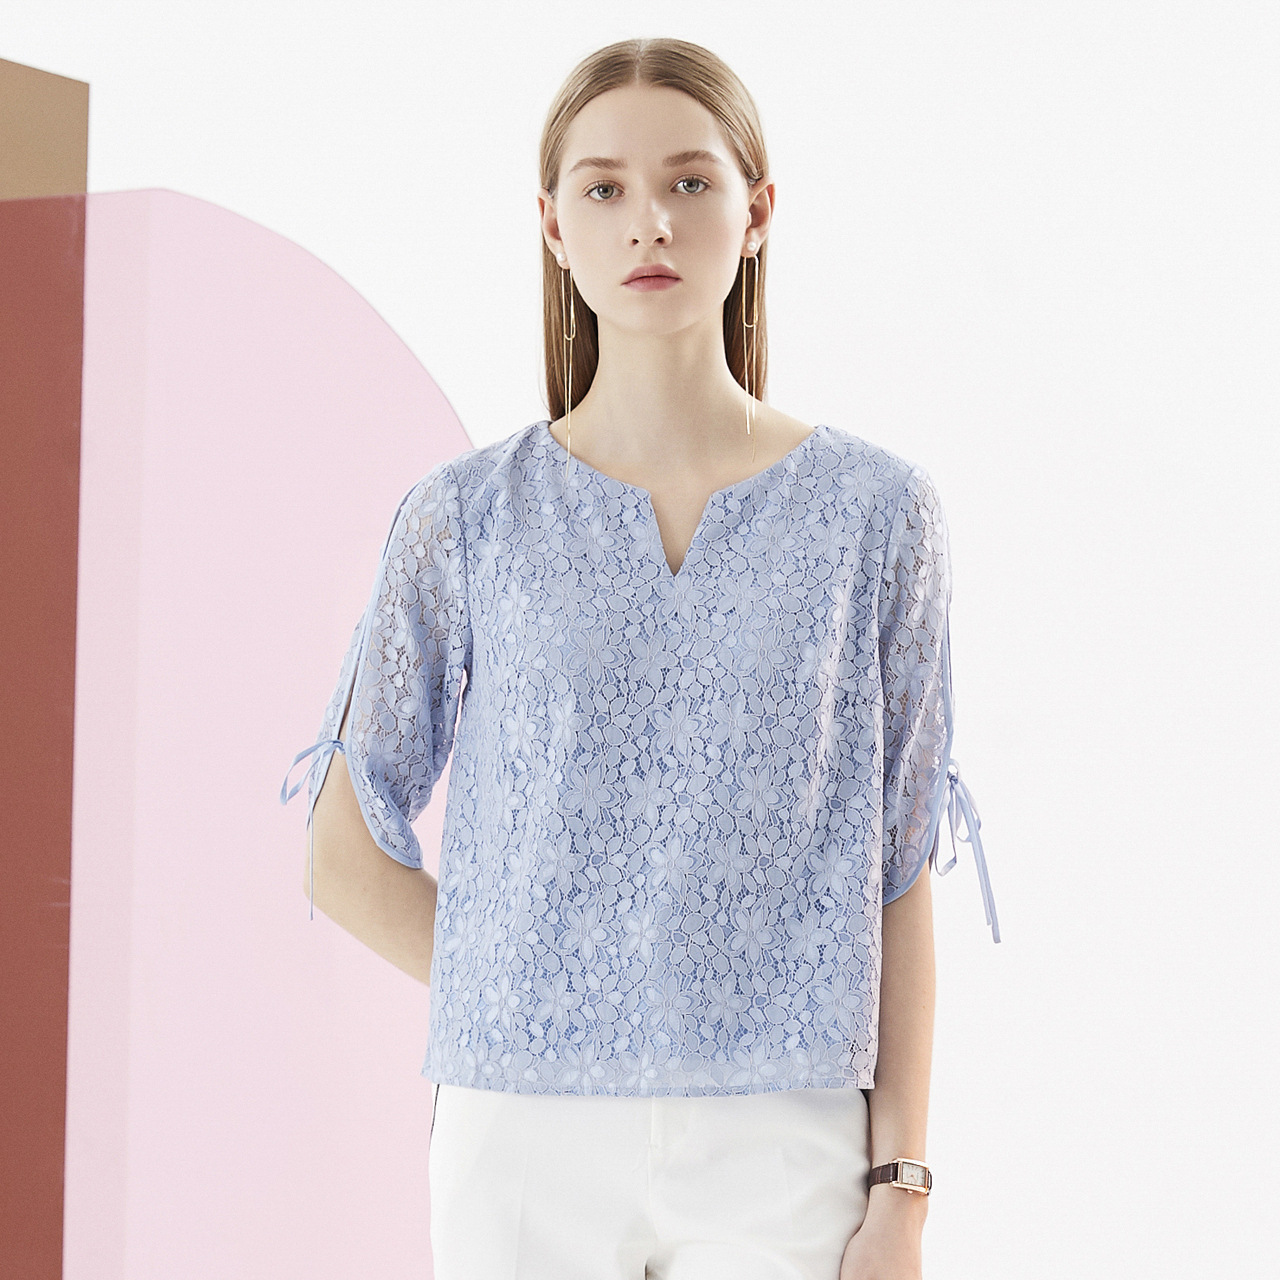 Cardidale autumn new lace print V leader elegant versatile blouse